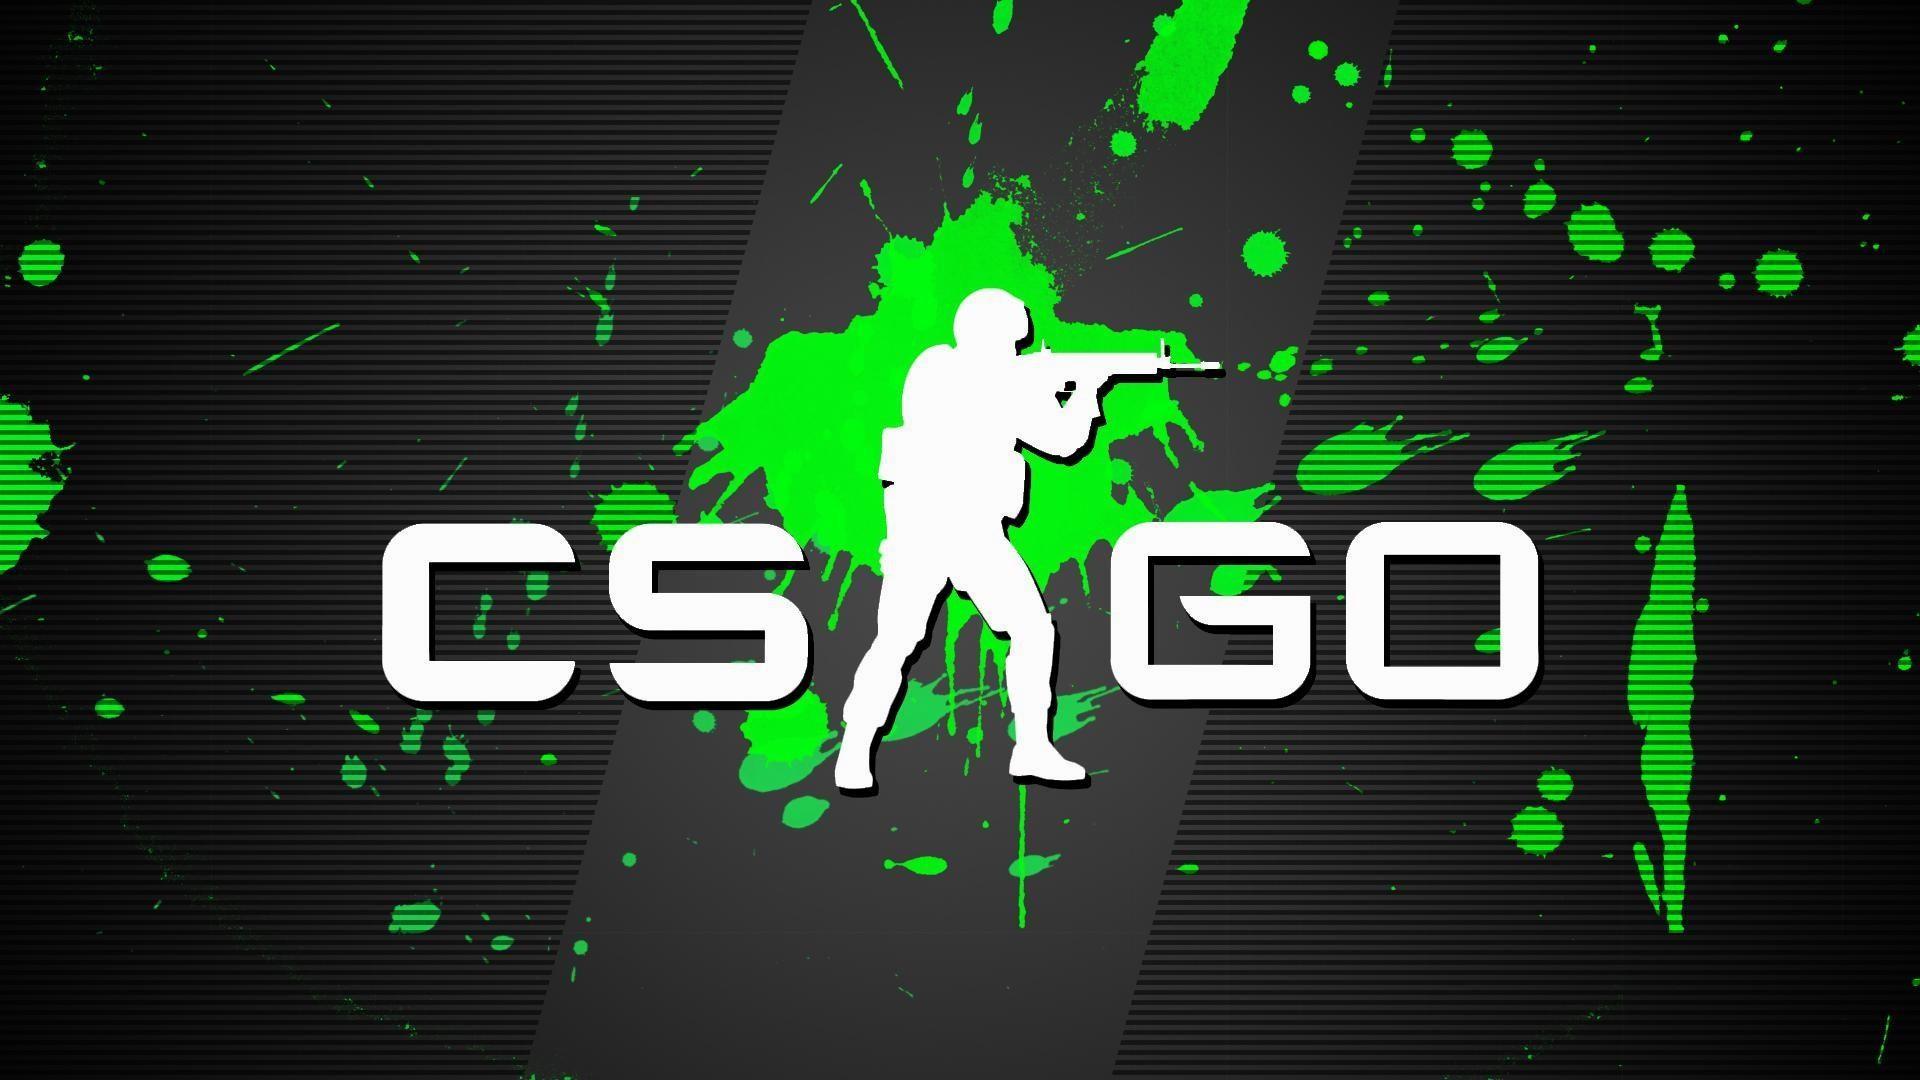 cs-go-hd-1080p-high-quality-wallpaper-wp4004934